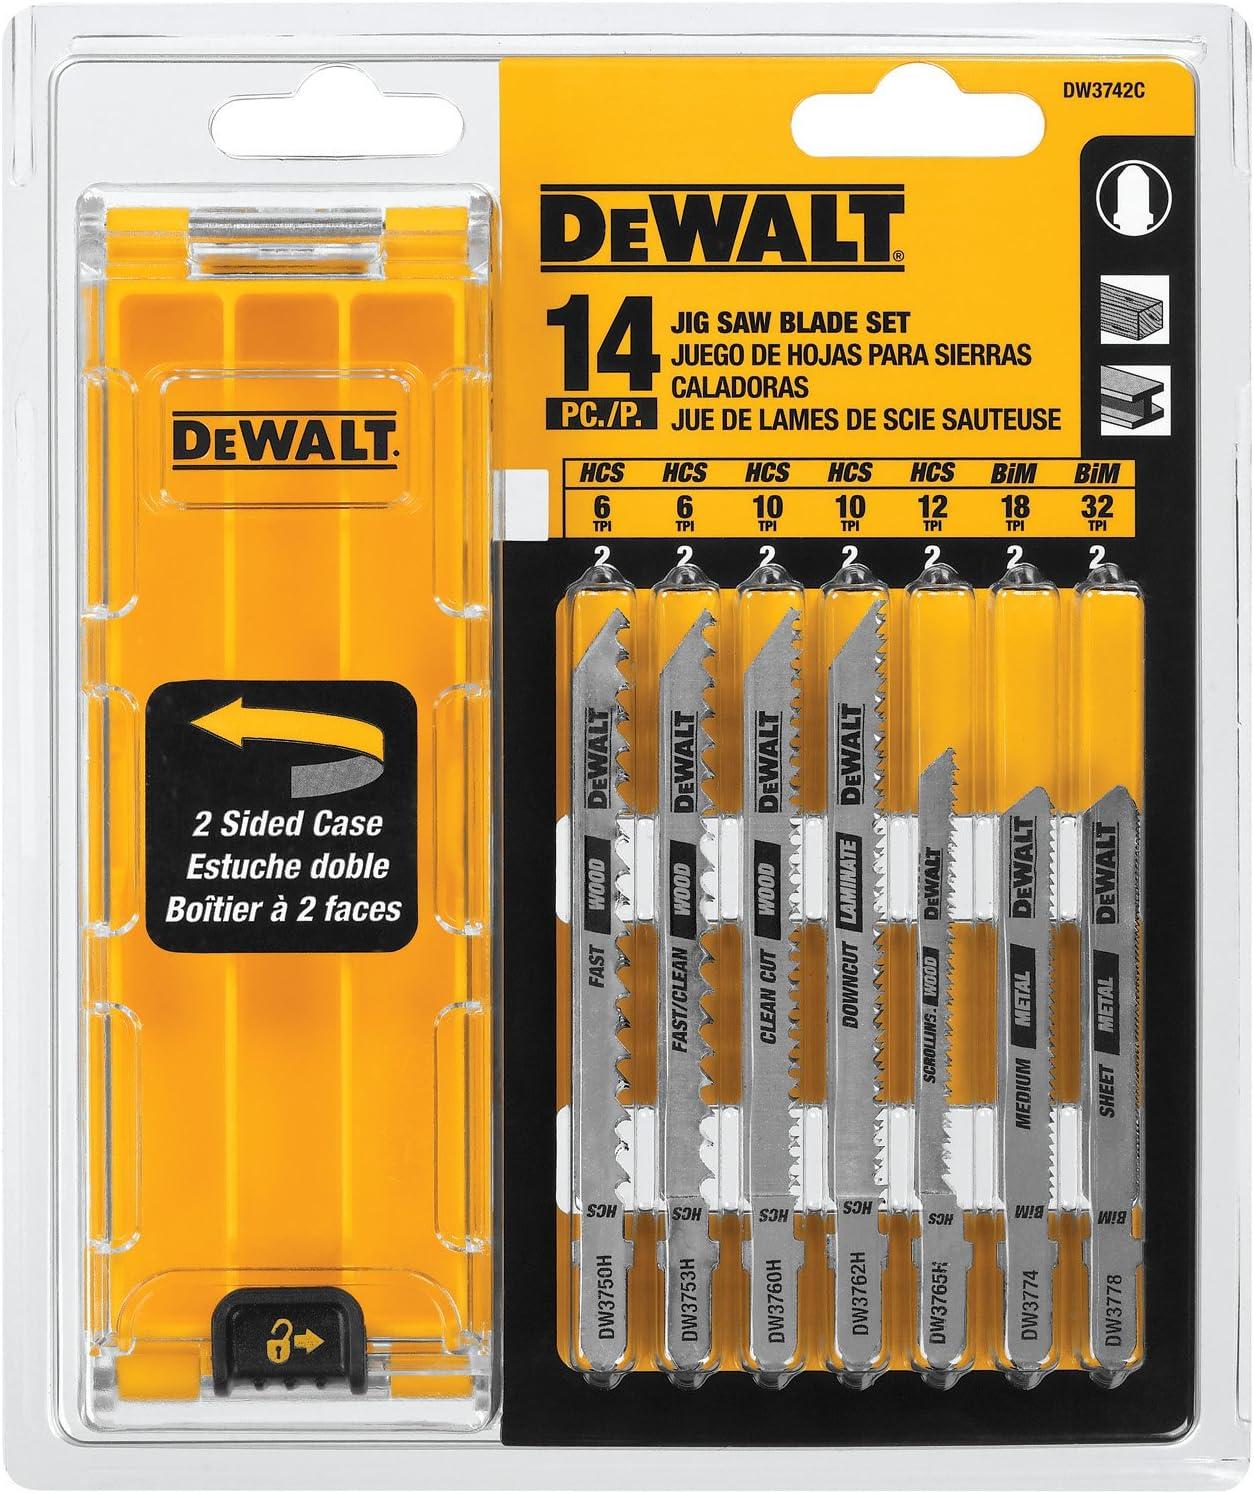 2. DEWALT DW3742C 14 Piece T-Shank Jigsaw Blade Kit